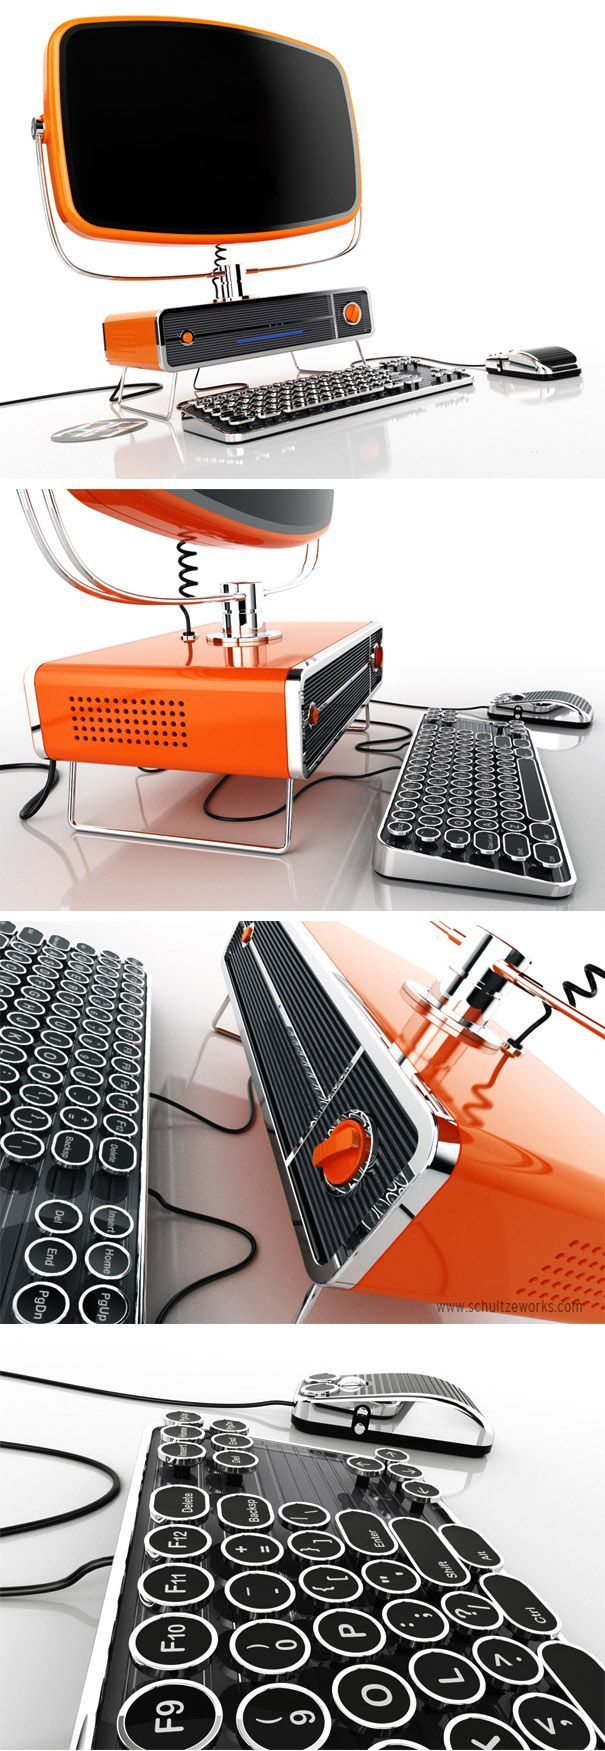 I'm an Apple girl, but if I were to get a PC... The Philco PC Concept - SchultzeWORKS designstudio